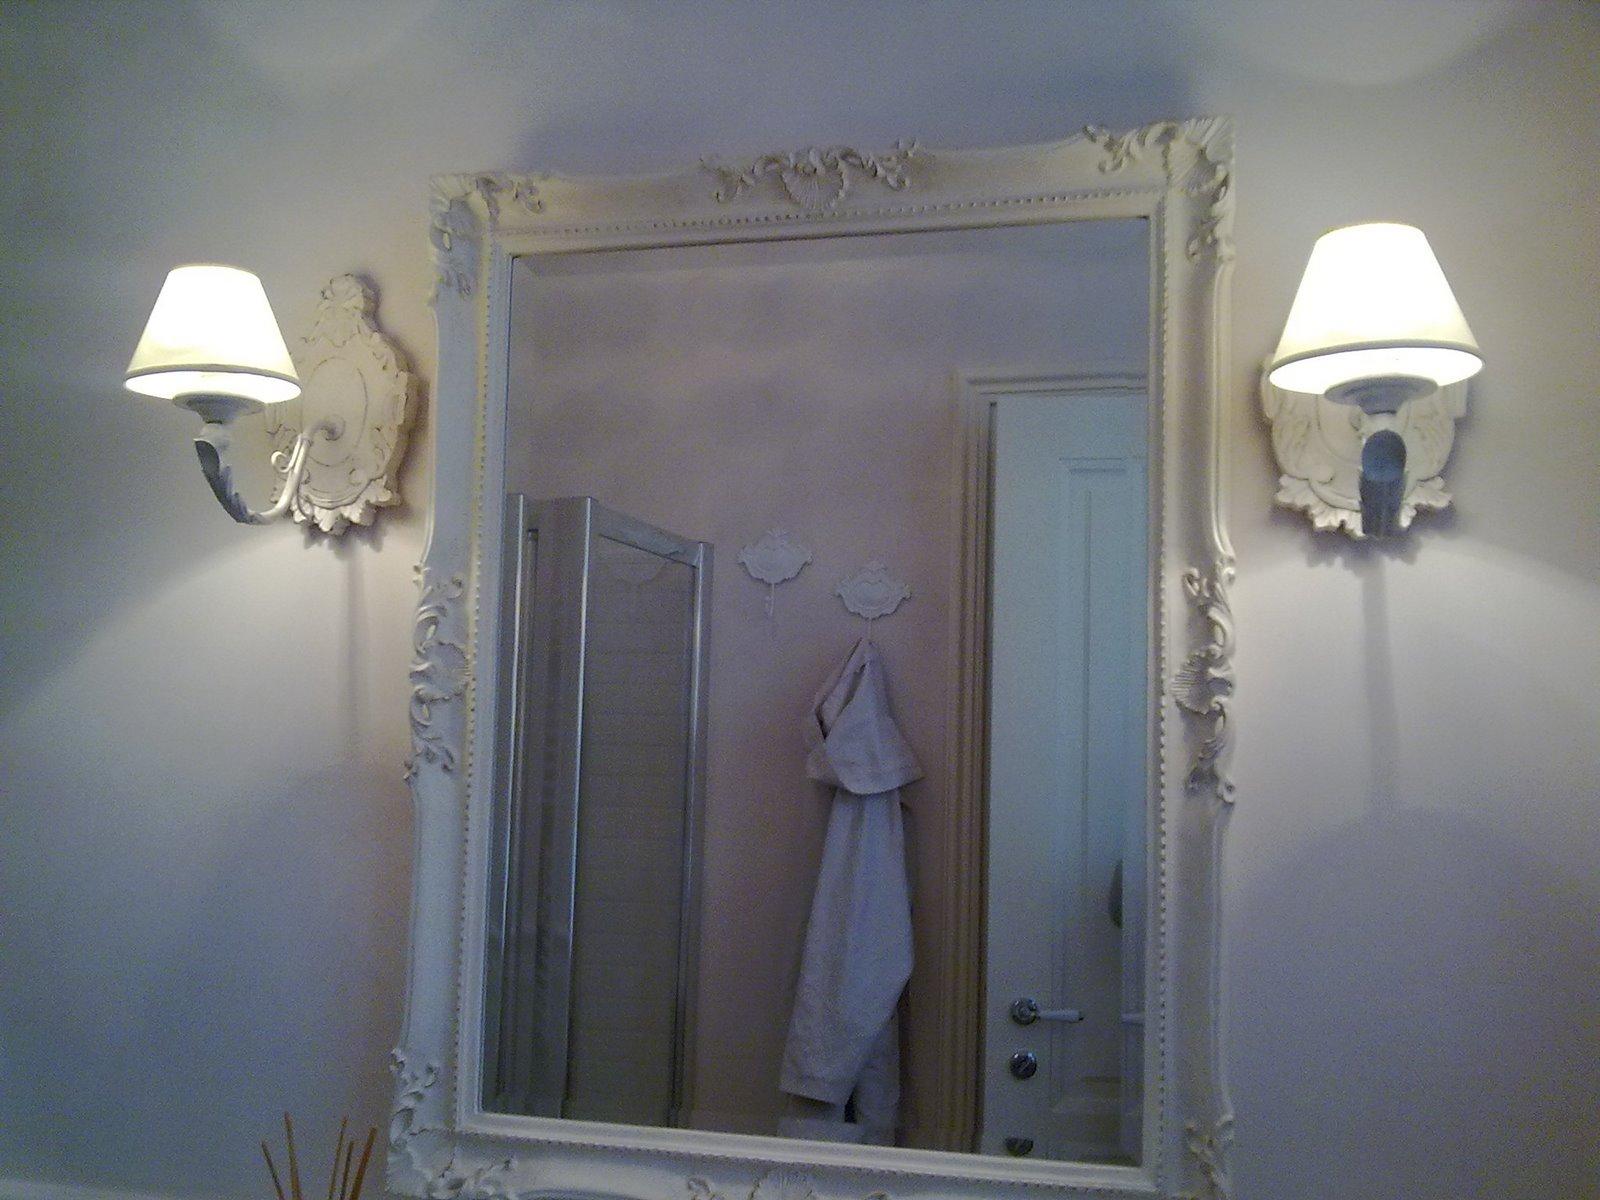 Vetrina cattelan italia modello charme arredare moderno